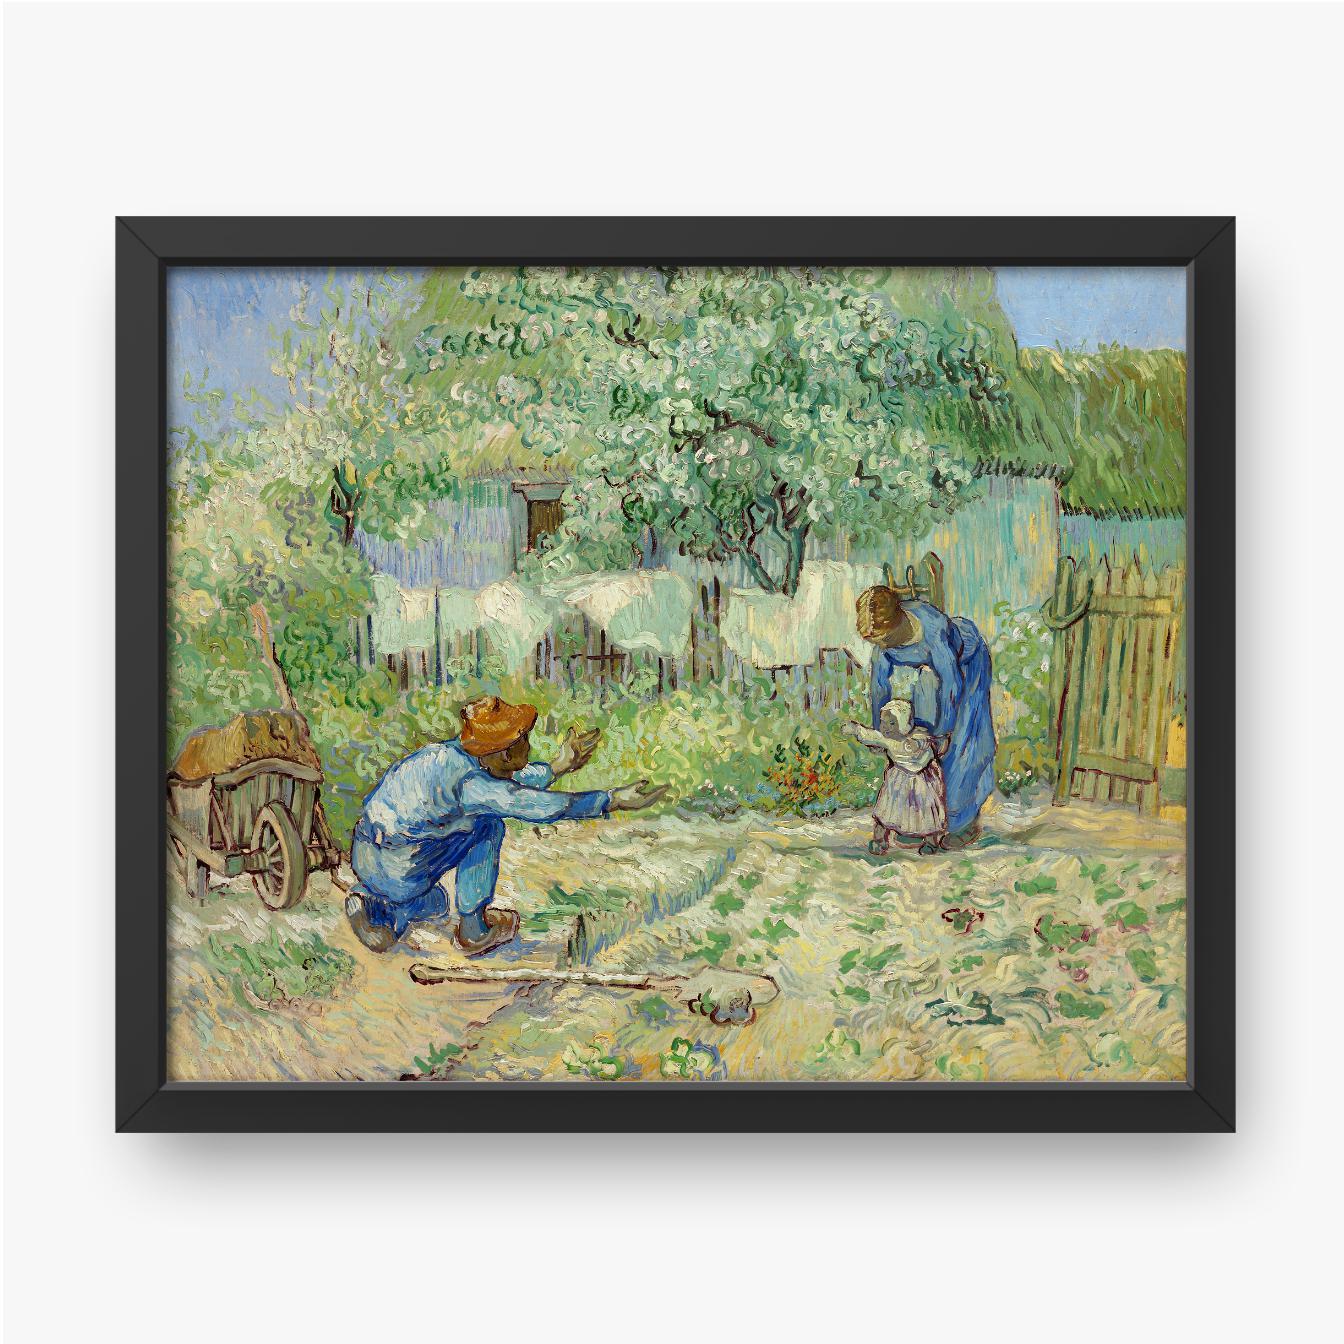 Vincent van Gogh, Pierwsze kroki, według Milleta, 1890